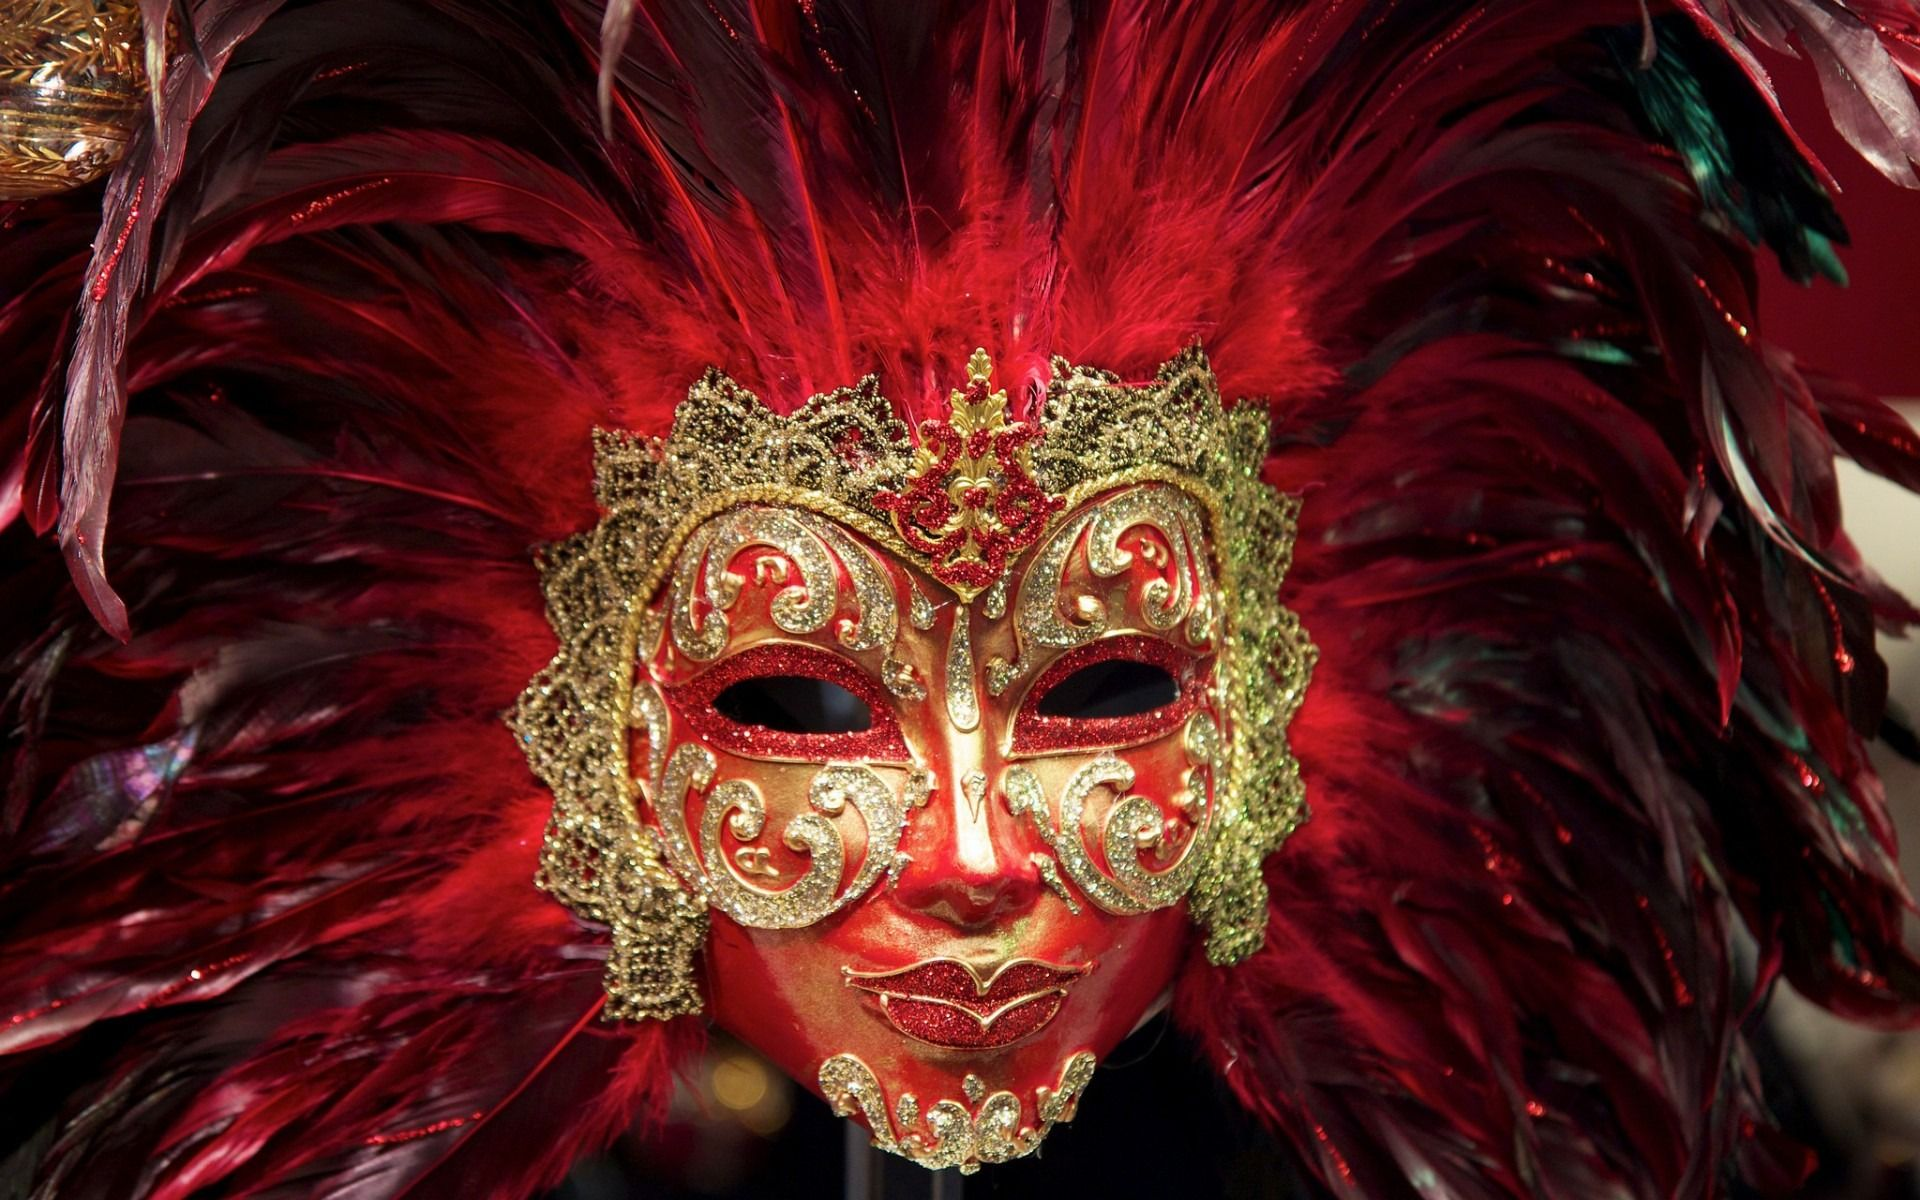 Feather carnival mask 1920x1200 wallpaper venice - Carnival wallpaper ...